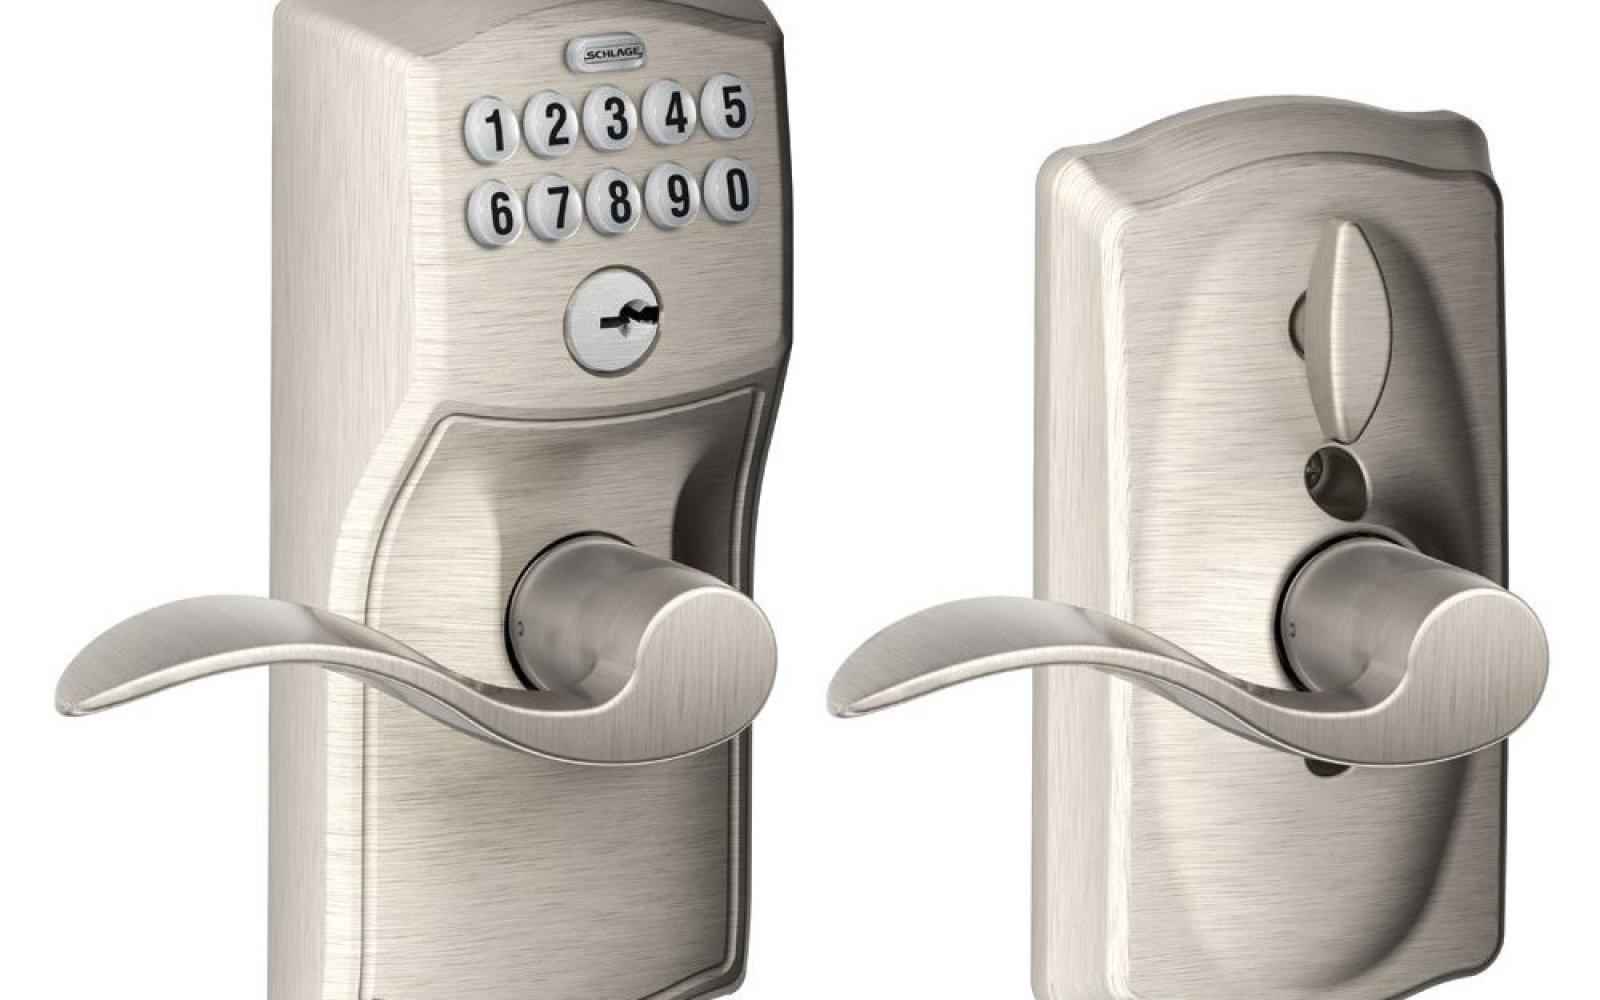 Home Schlage Camelot Keypad Lock 89 Reg 130 Pyrex